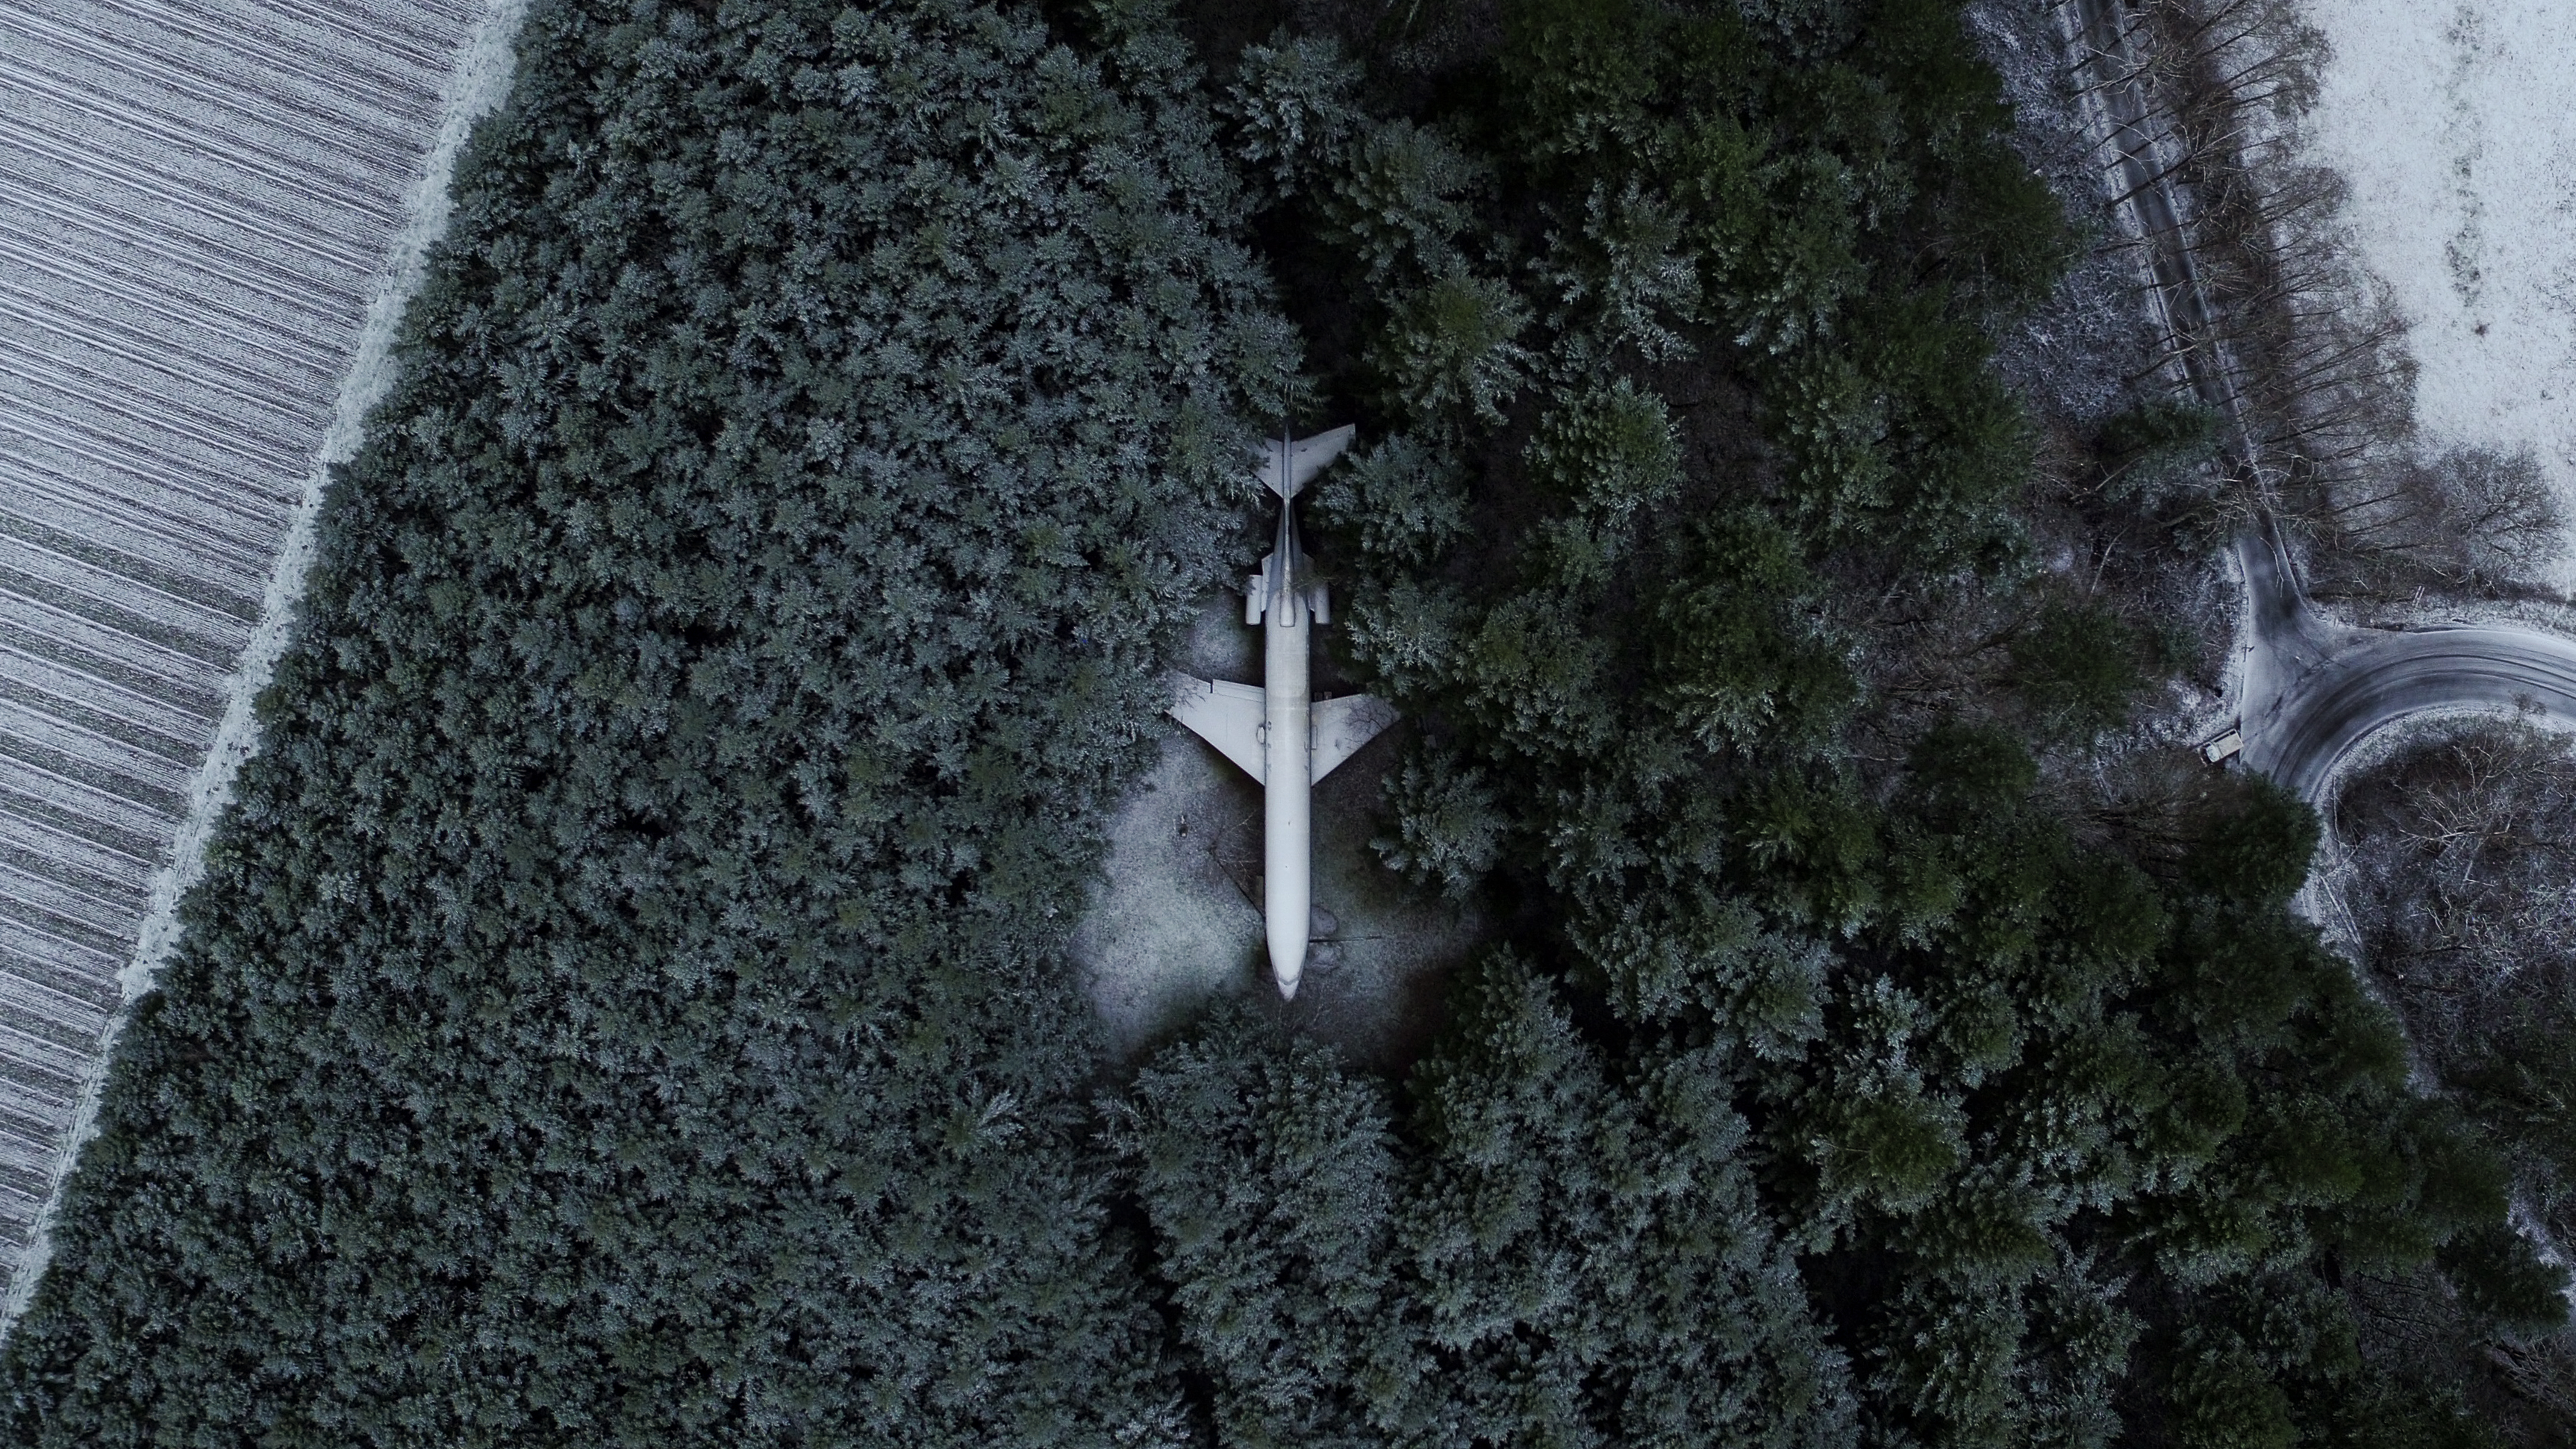 Plane Home - Hillsboro - Oregon -  Nilas